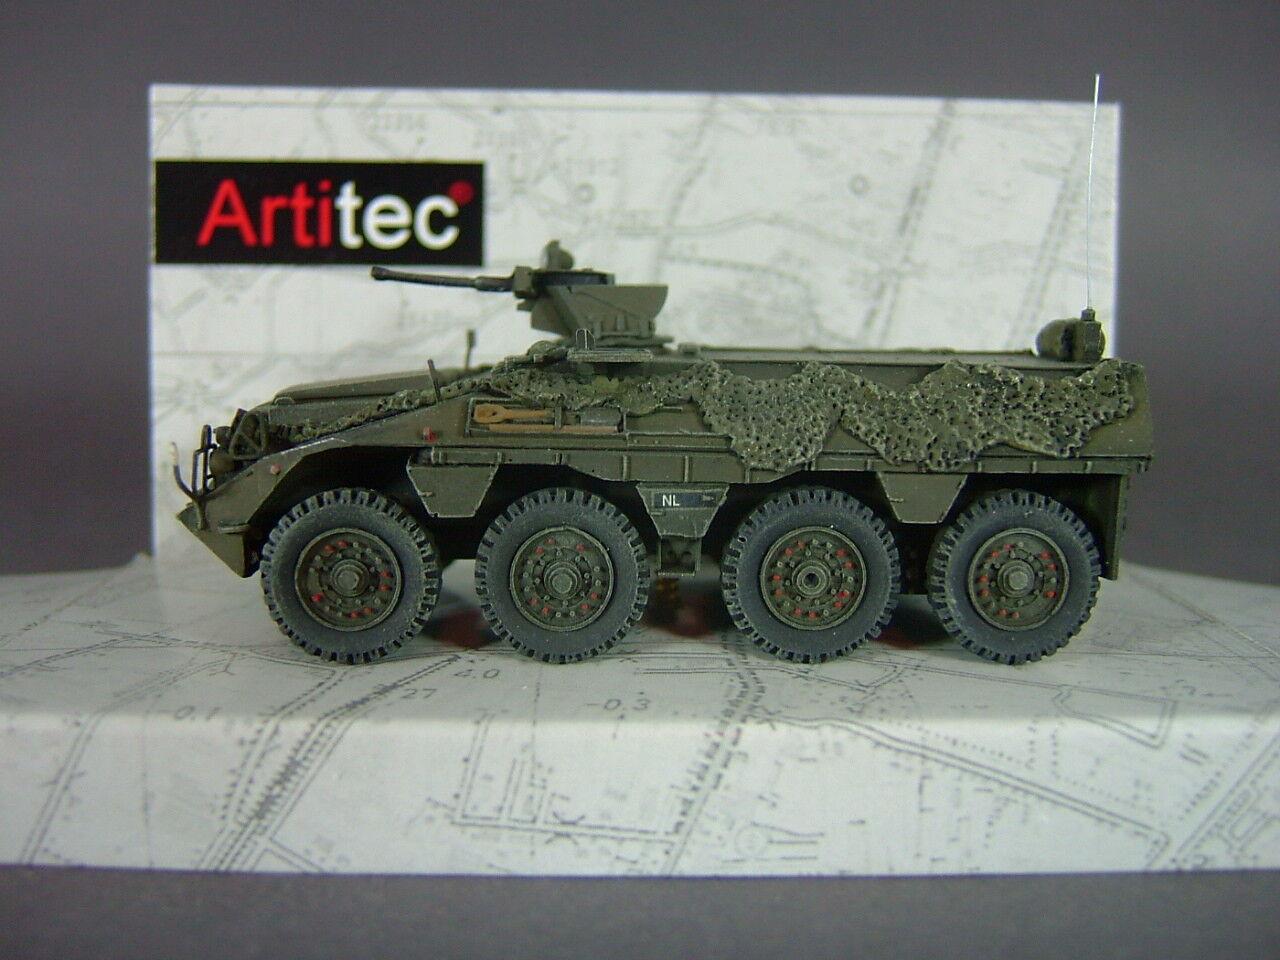 Artitec 387.151 NL DAF yp 408 PWI-gr carros carros carros blindados  Battle ready  nuevo & OVP c5bf89